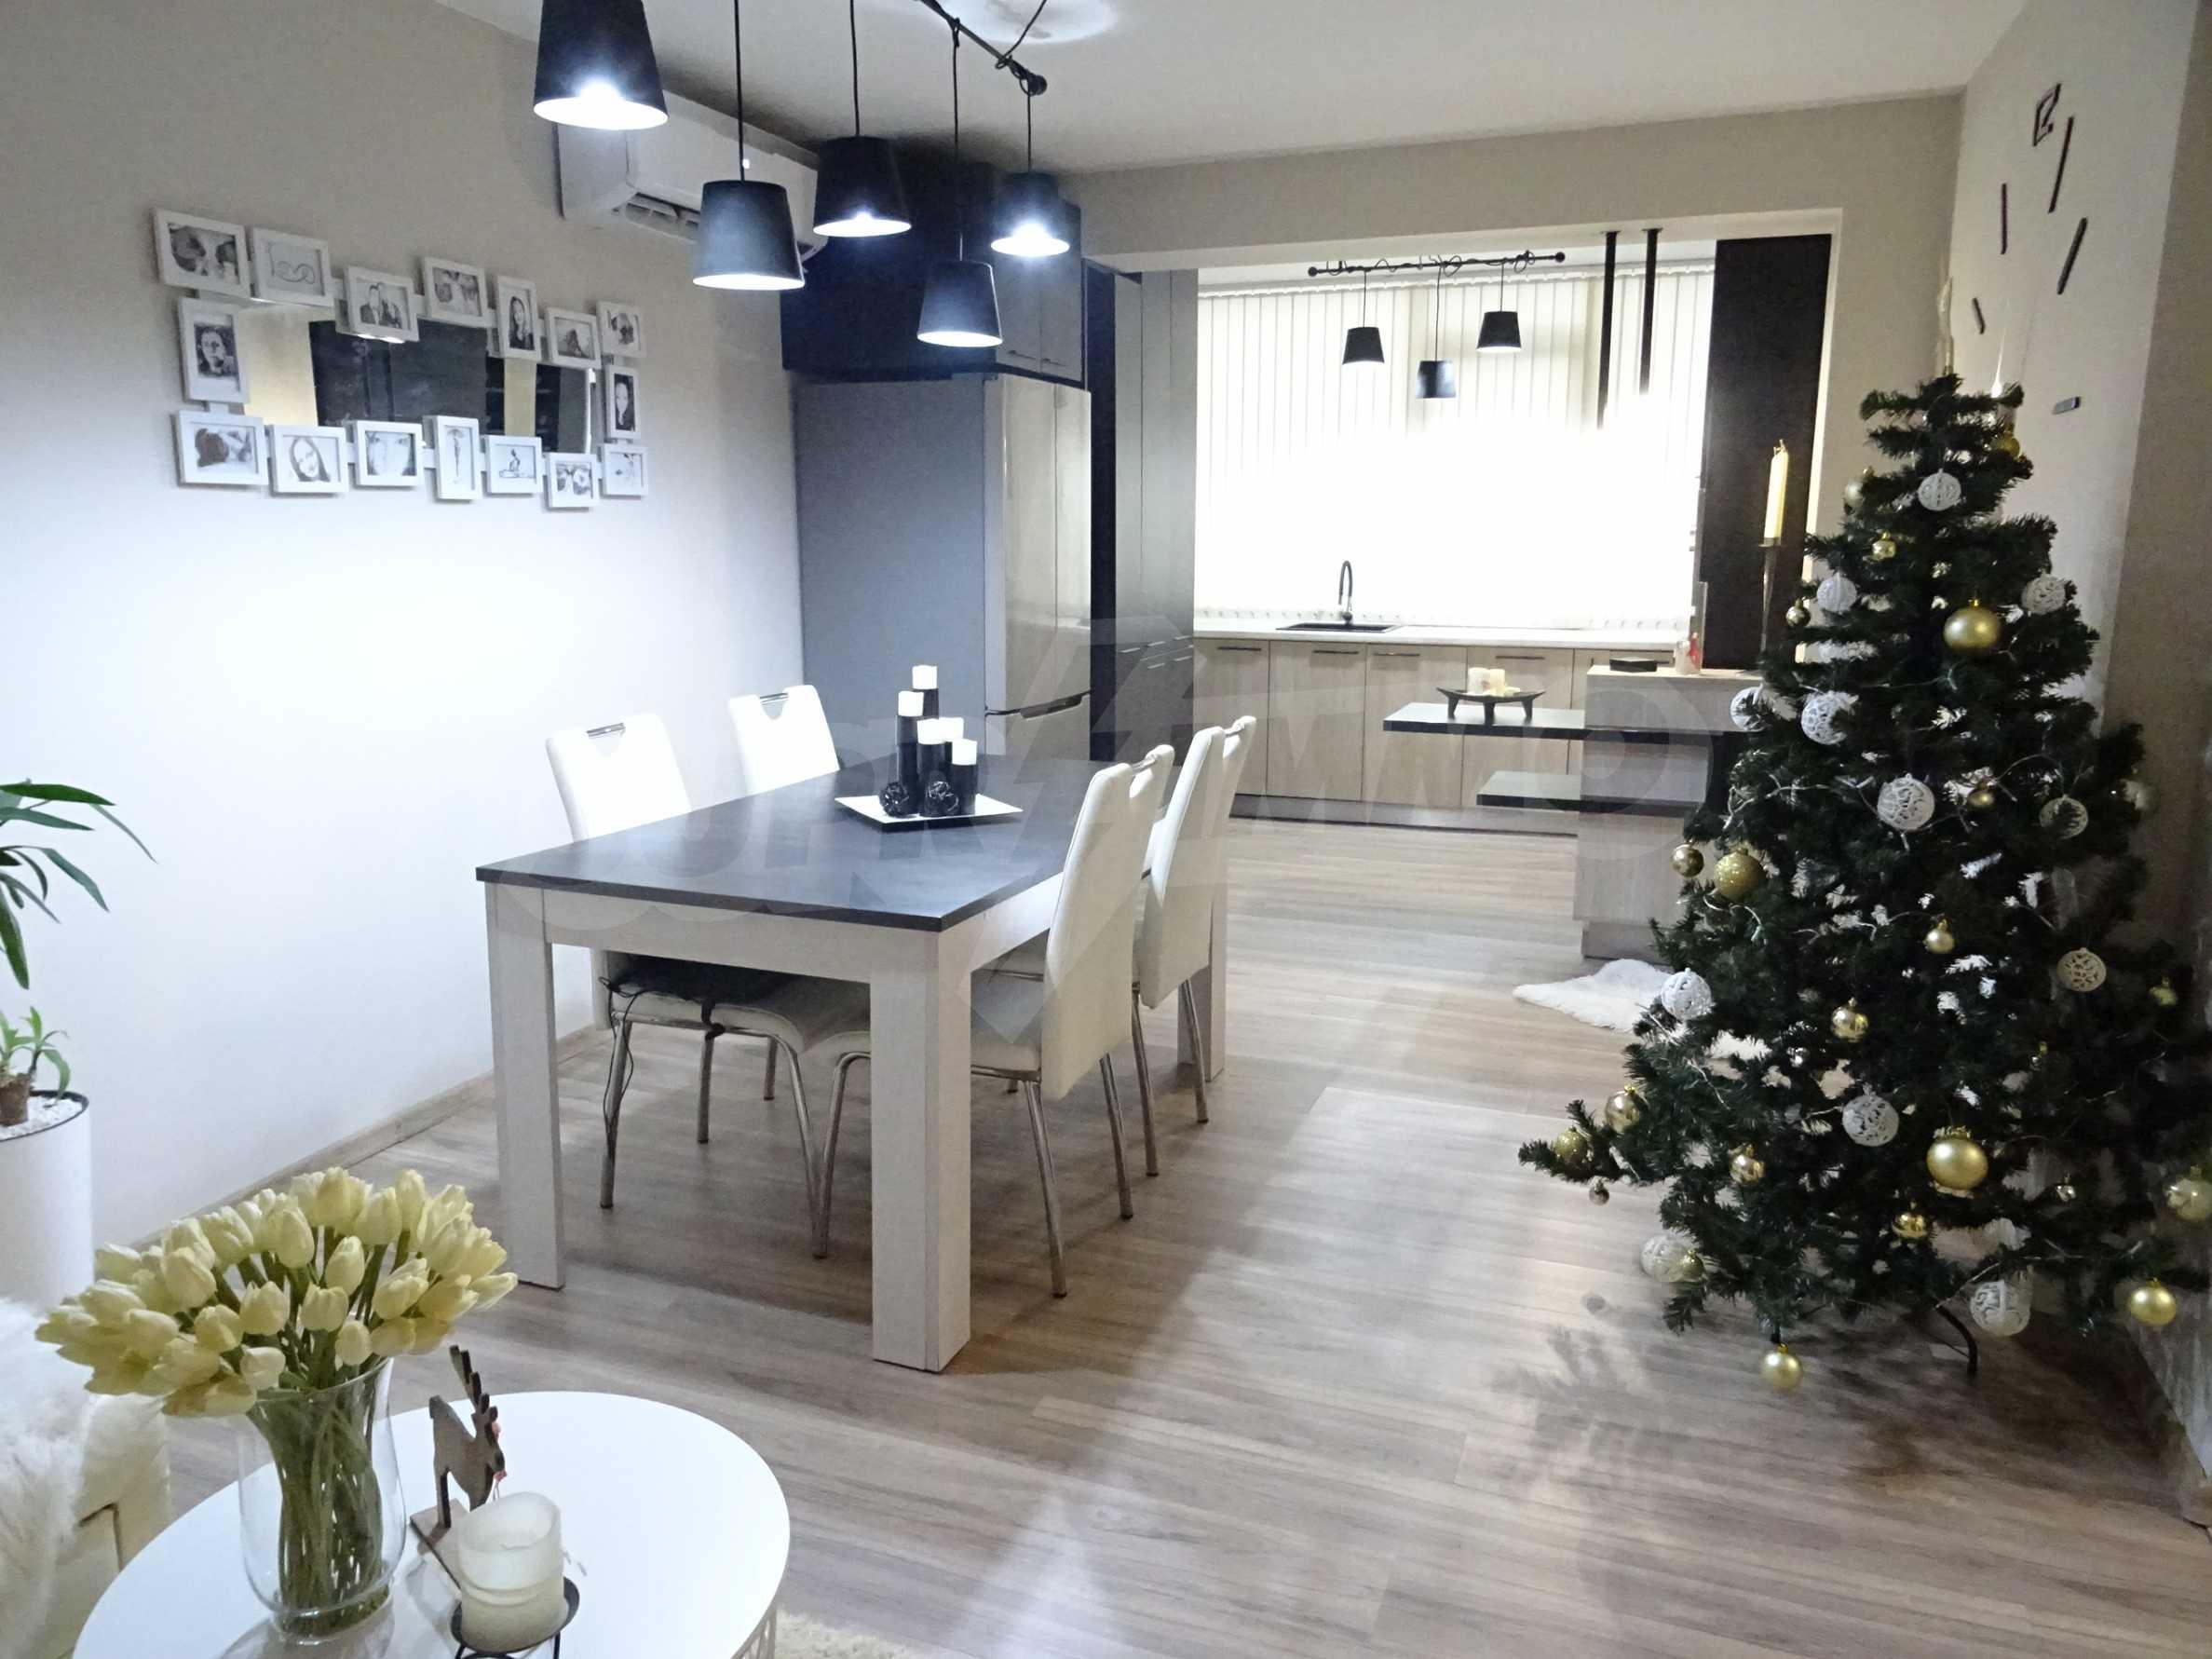 2-bedroom apartment for sale in Varna, Bulgaria - Sales - 2-bedroom apartment.